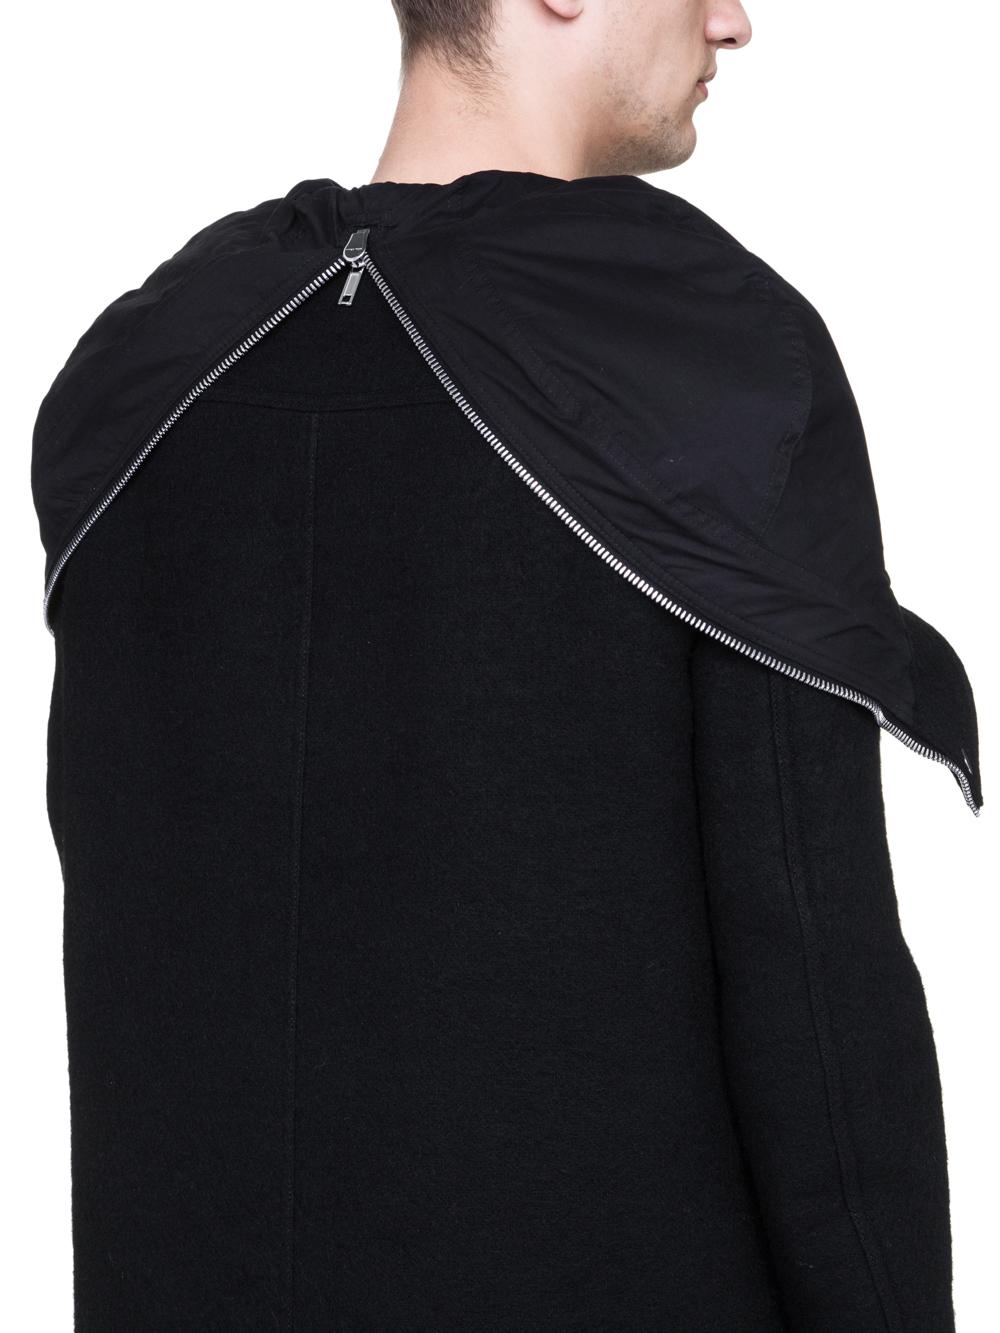 RICK OWENS MEGAPARKA IN BLACK BOILED WOOL